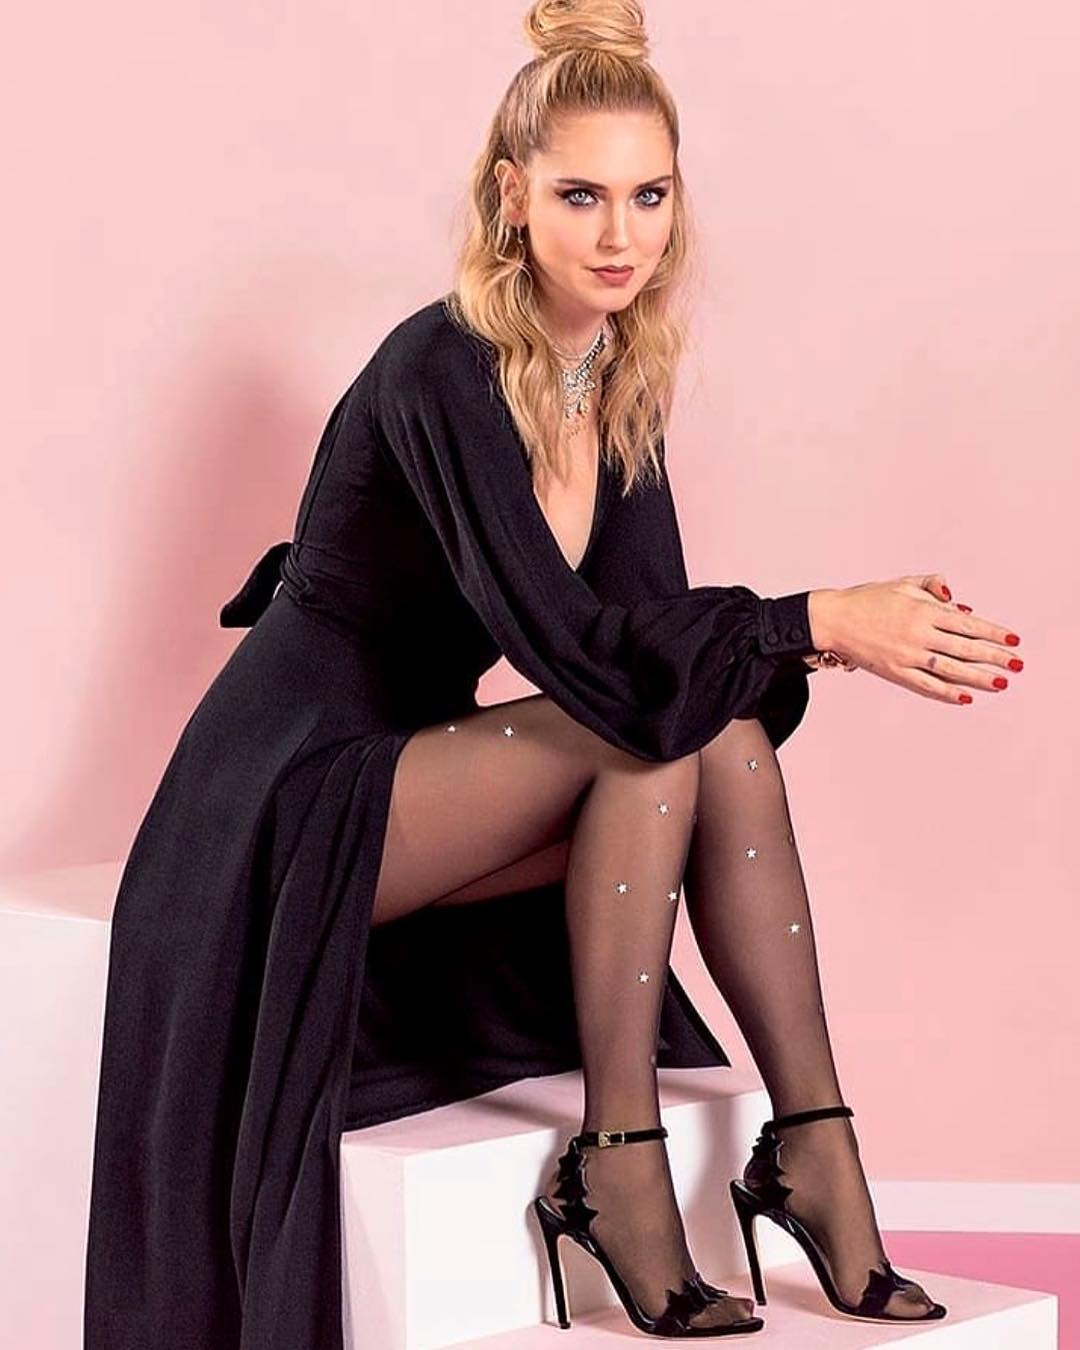 Chiara Ferragni Wearing Bell Sleeve Dress And Half-Up Half-Down Knot 2021